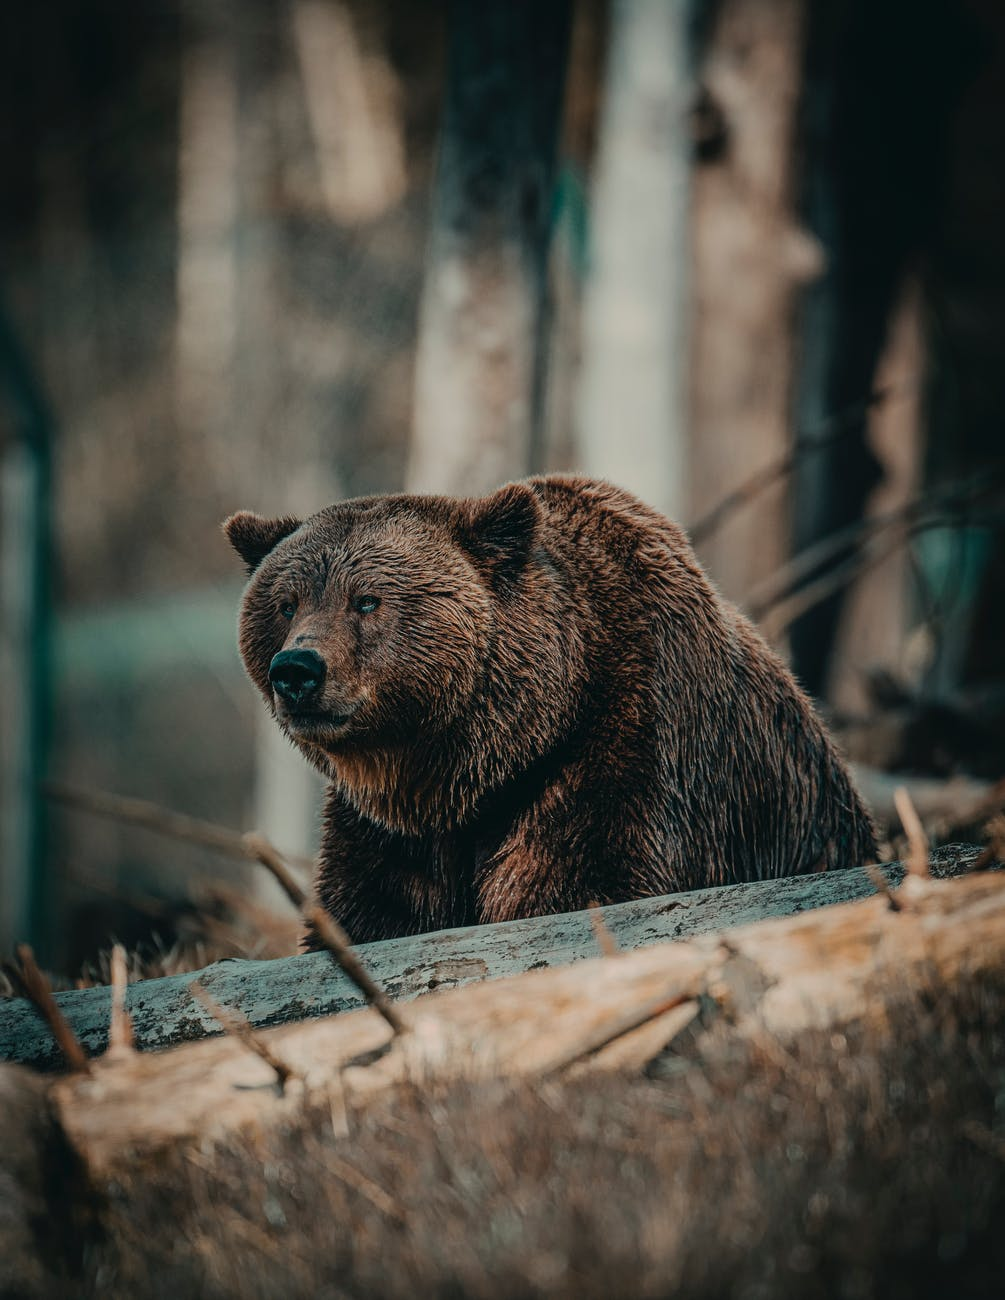 dreaming symbol, sign of a bear